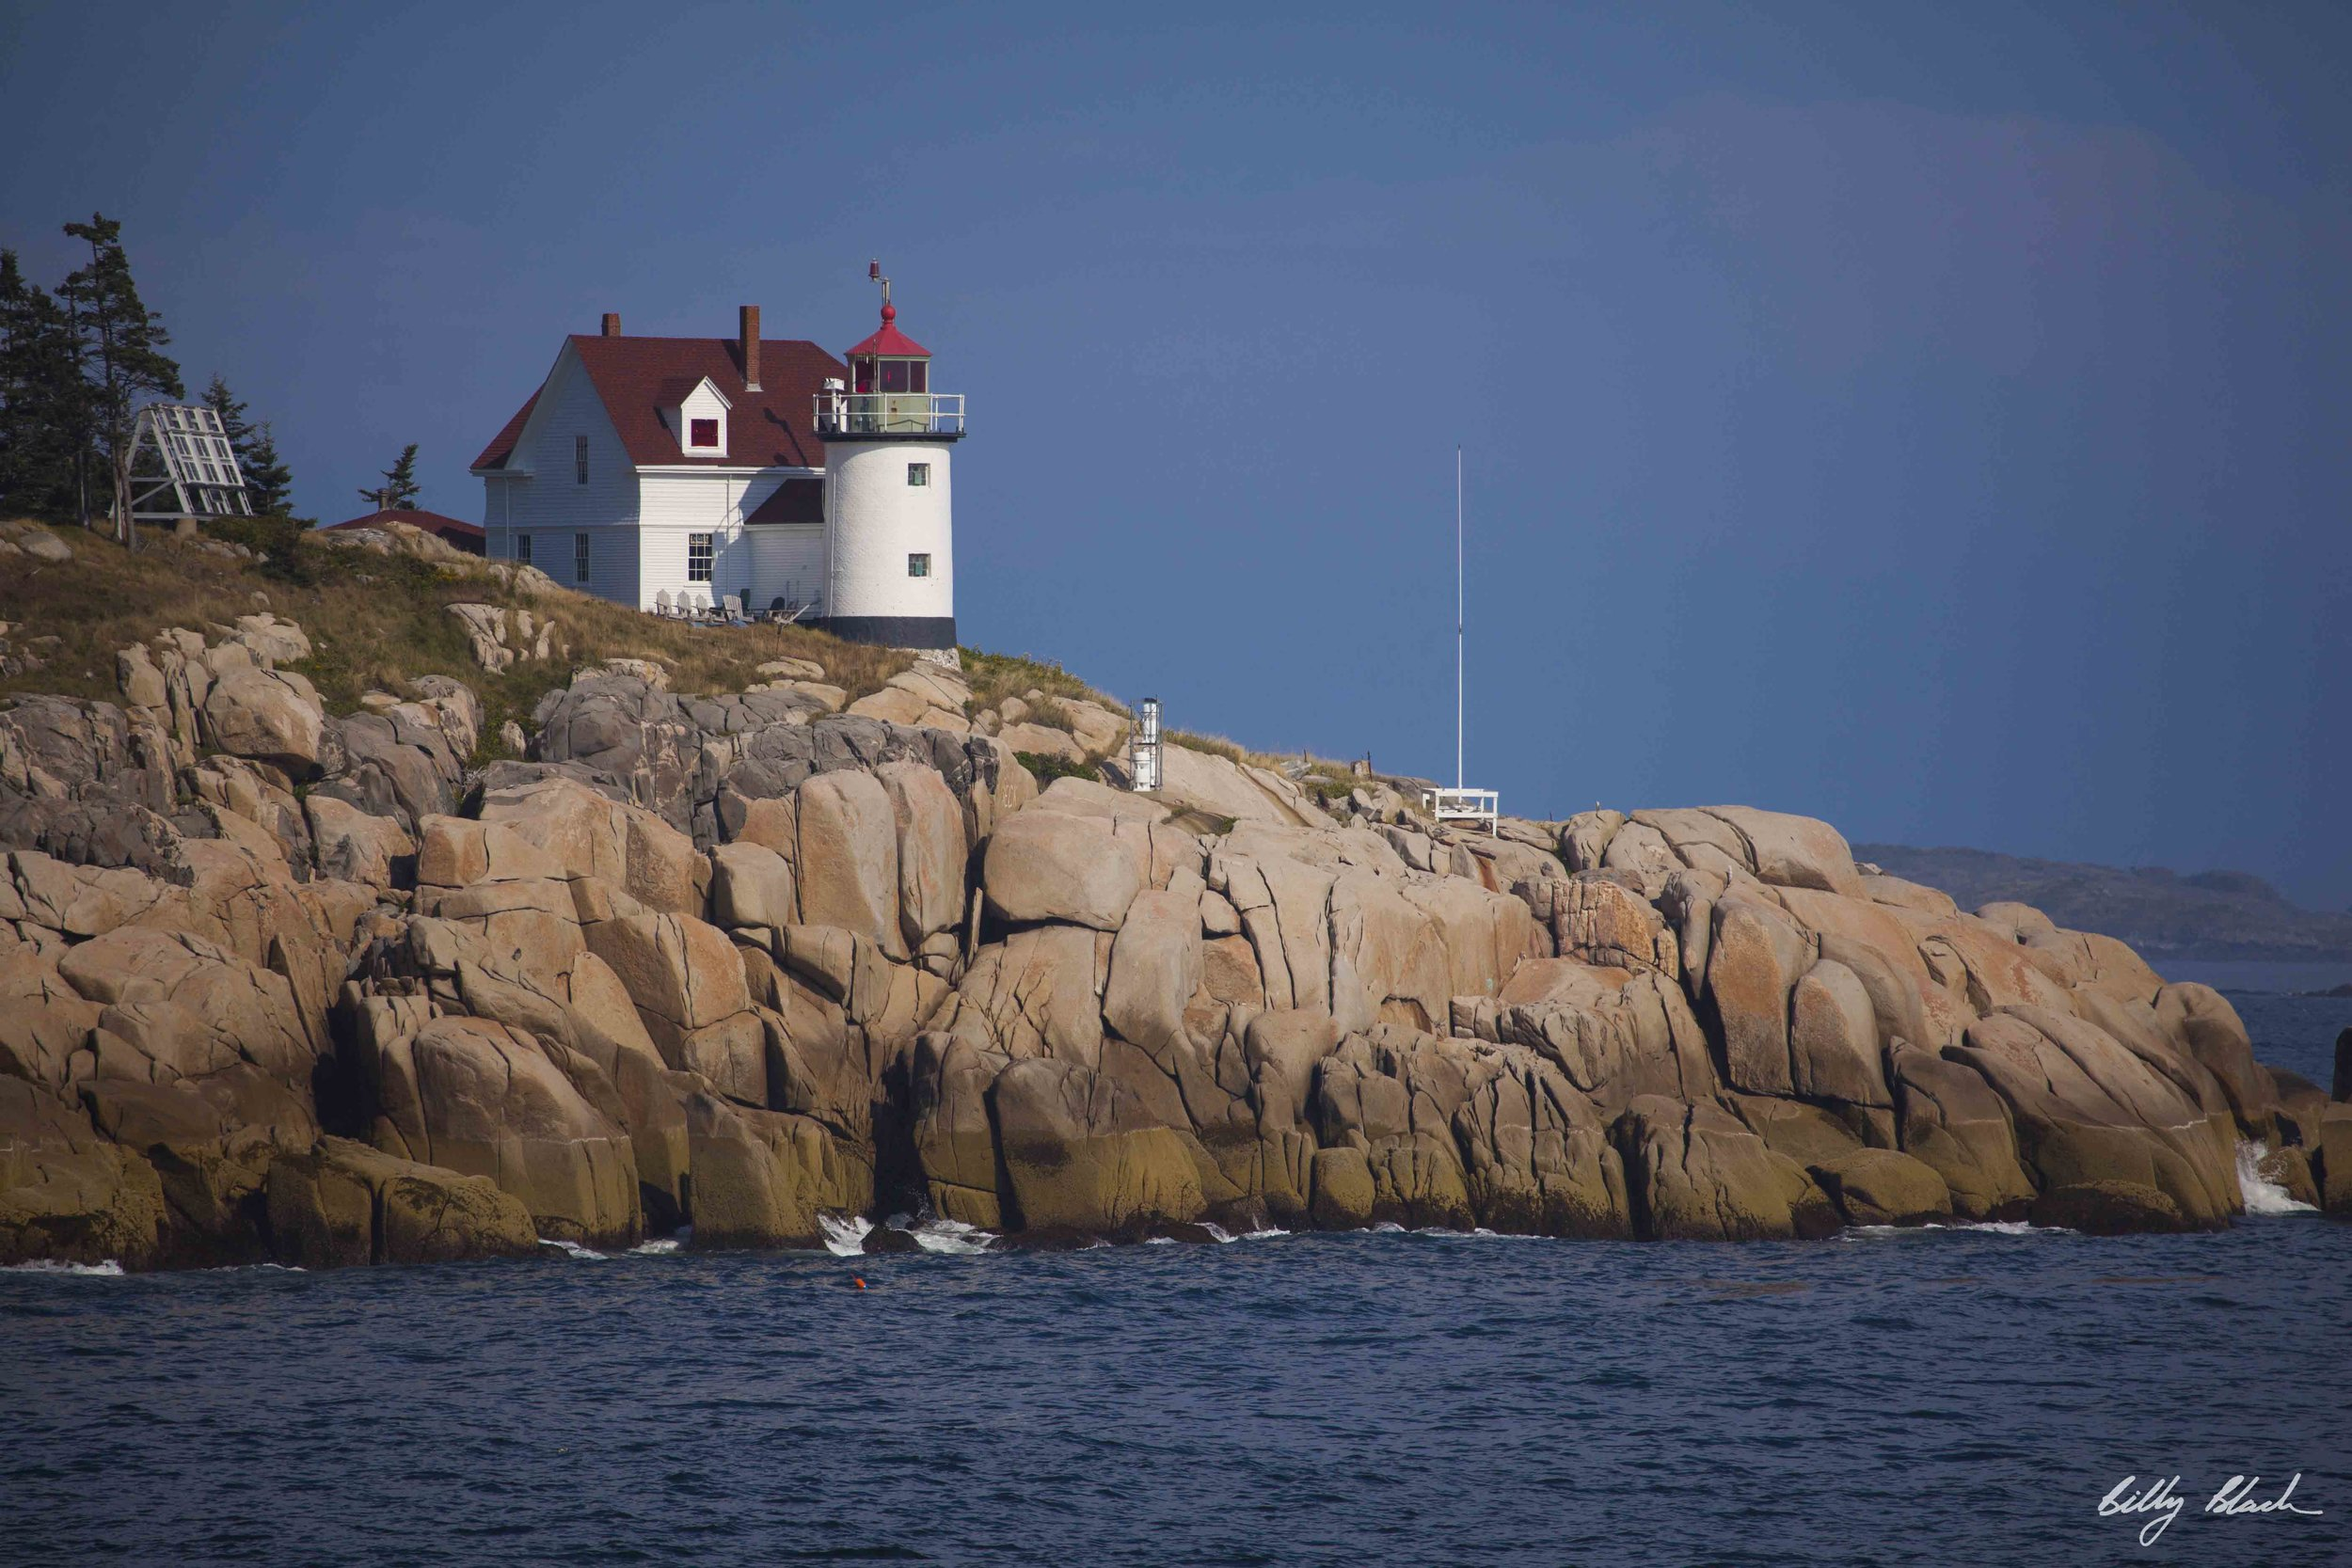 Penobscott Bay near Vinalhavan, Maine.